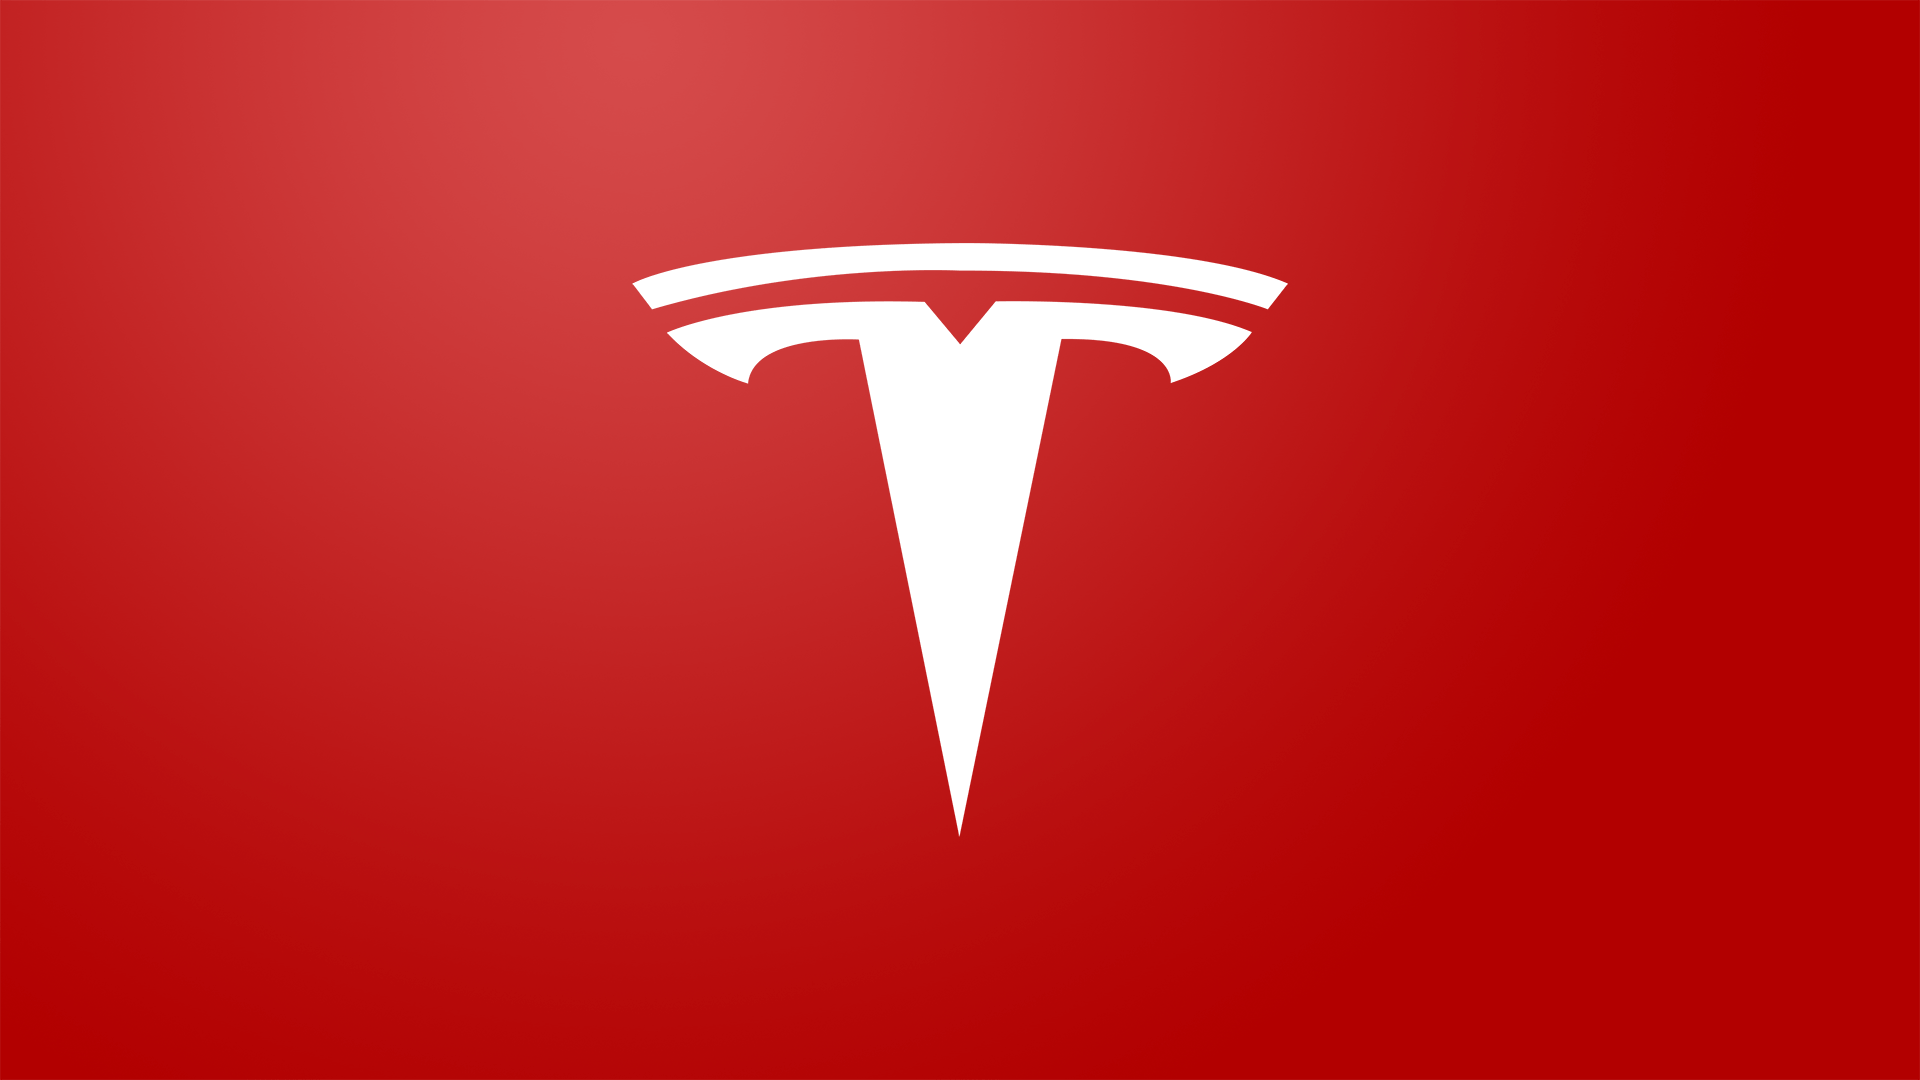 Tesla Logo Wallpapers Wallpaper Cave